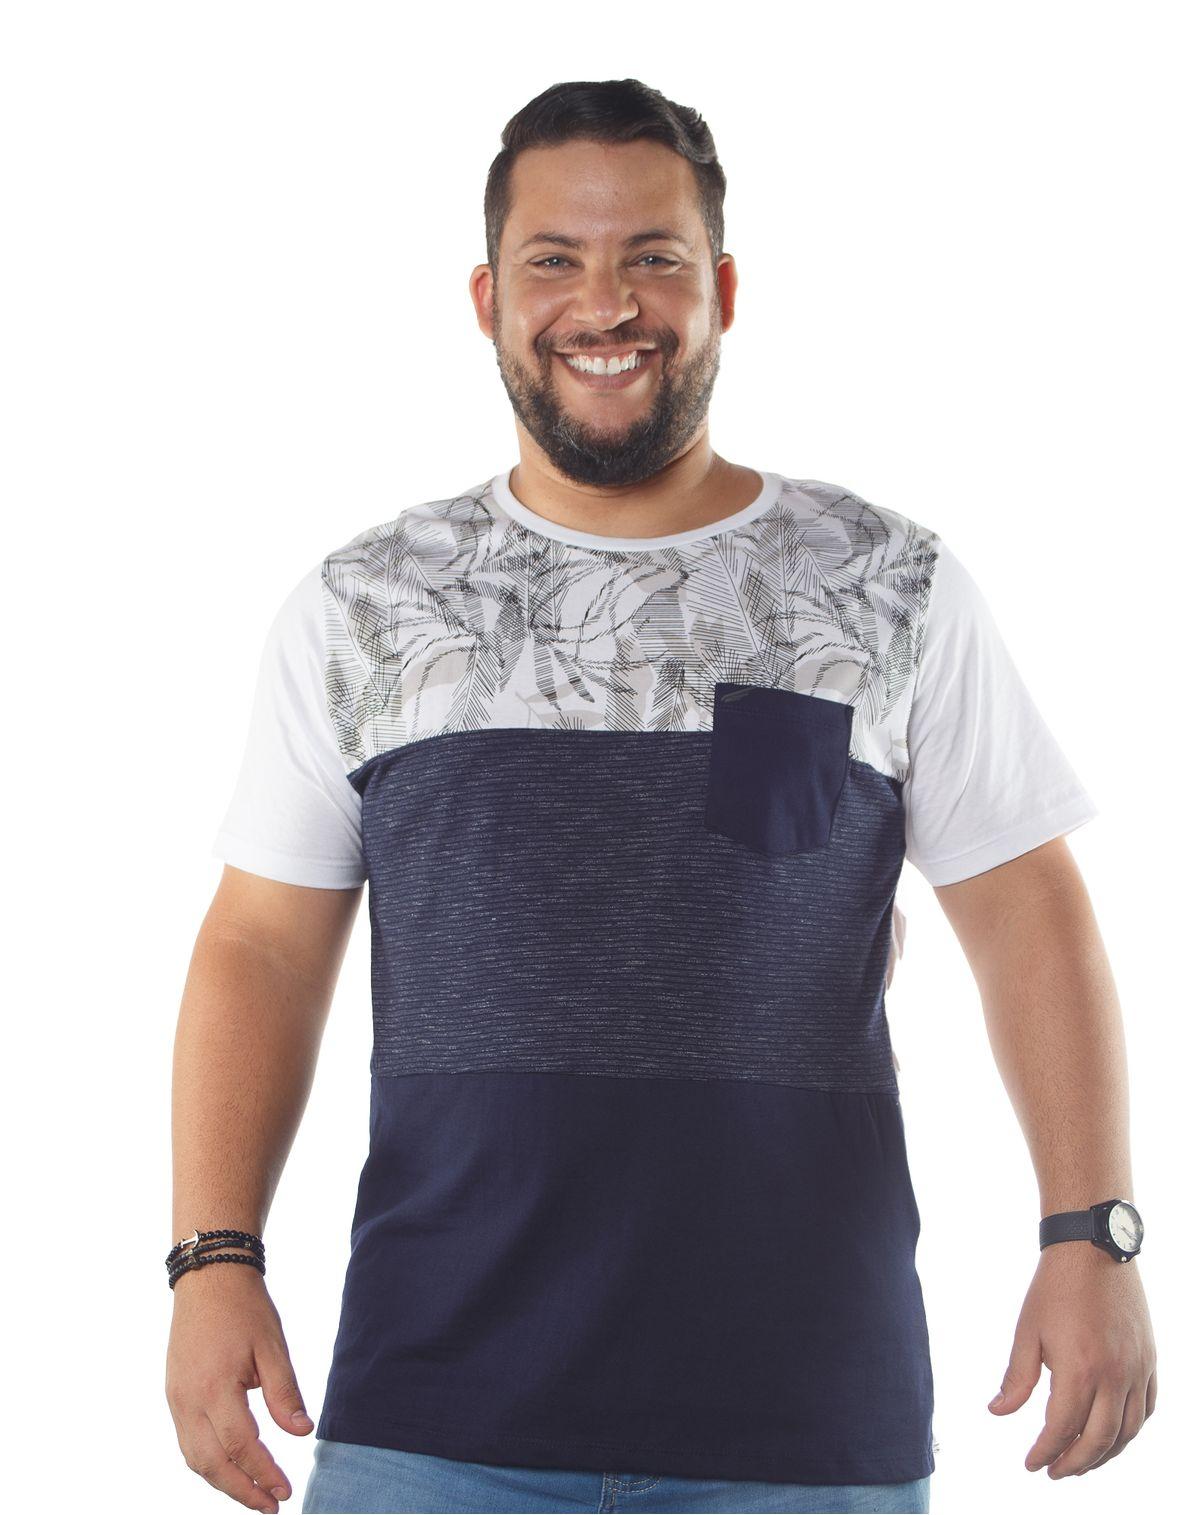 559391001-camiseta-manga-curta-plus-masculina-recortes-tropical-bolso-branco-g1-7c0